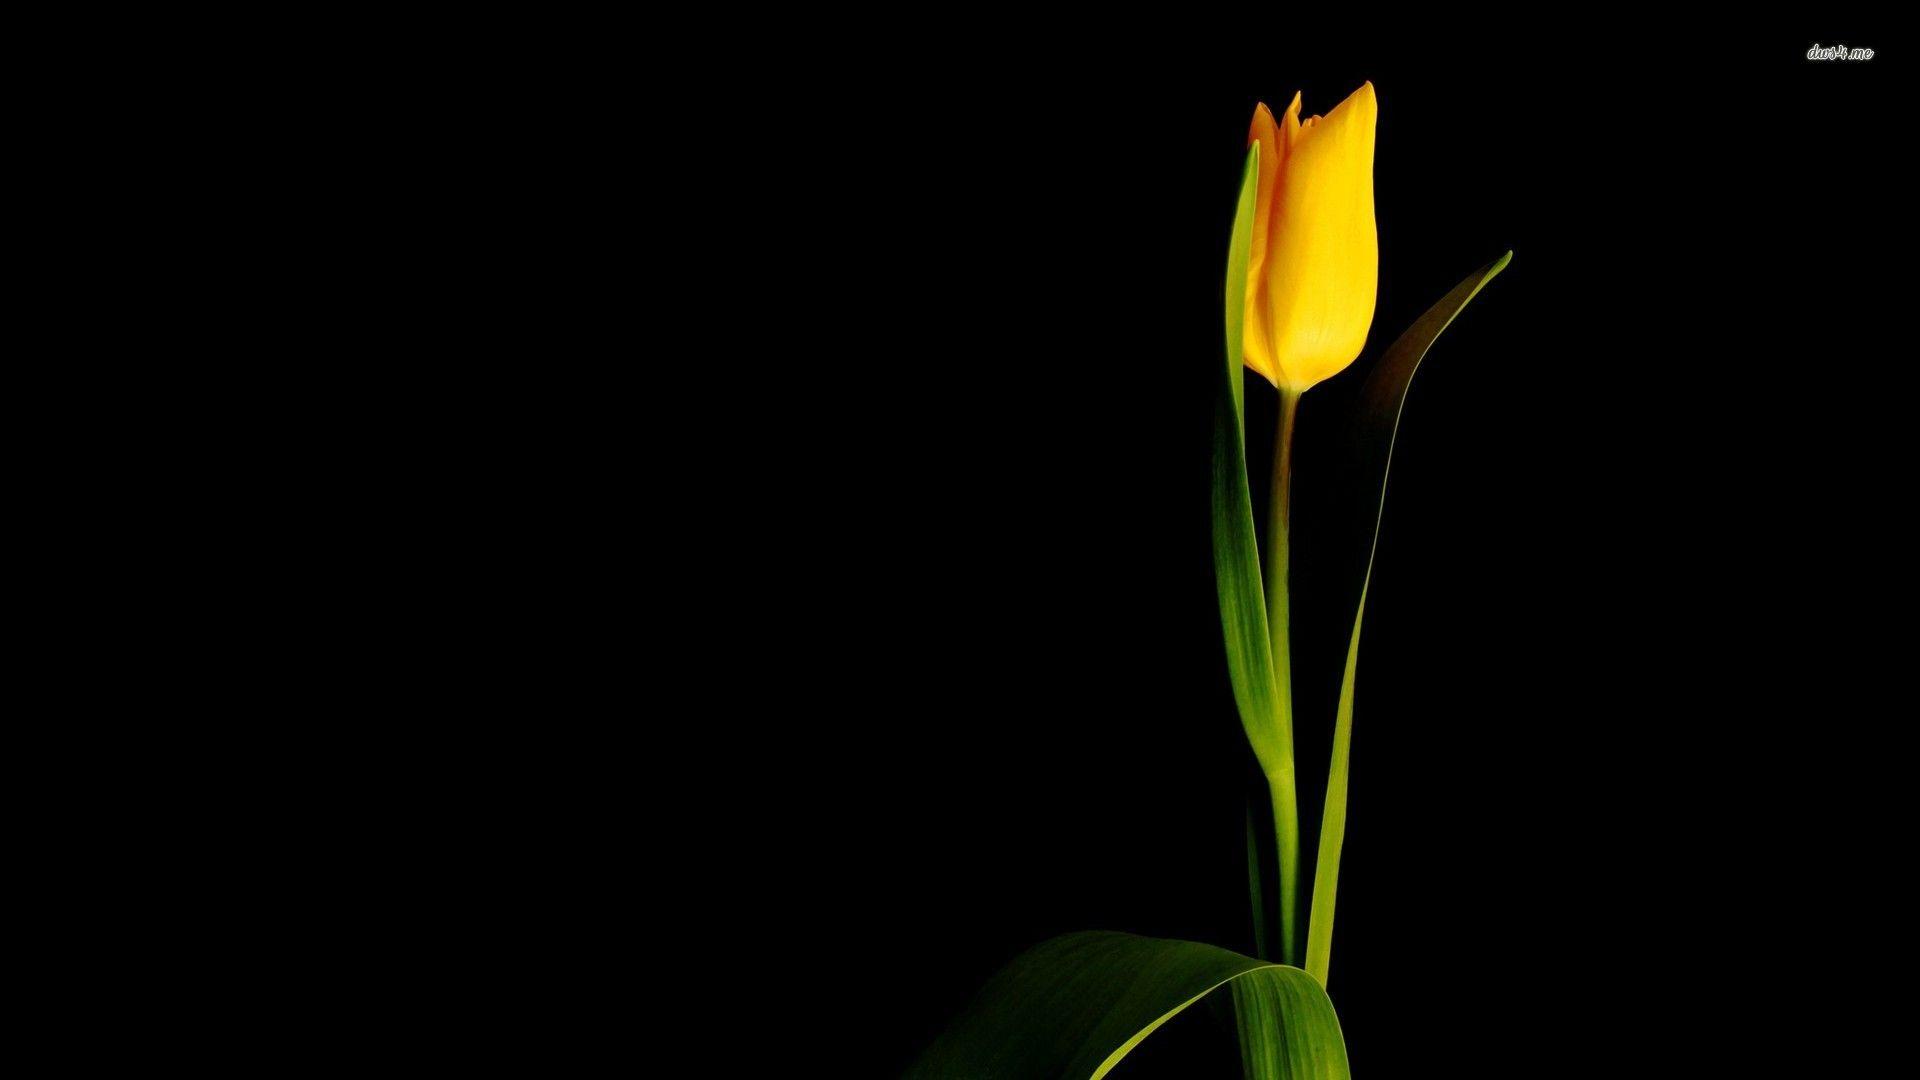 Yellow Tulip Wide Desktop Background Wallpapers HD Free